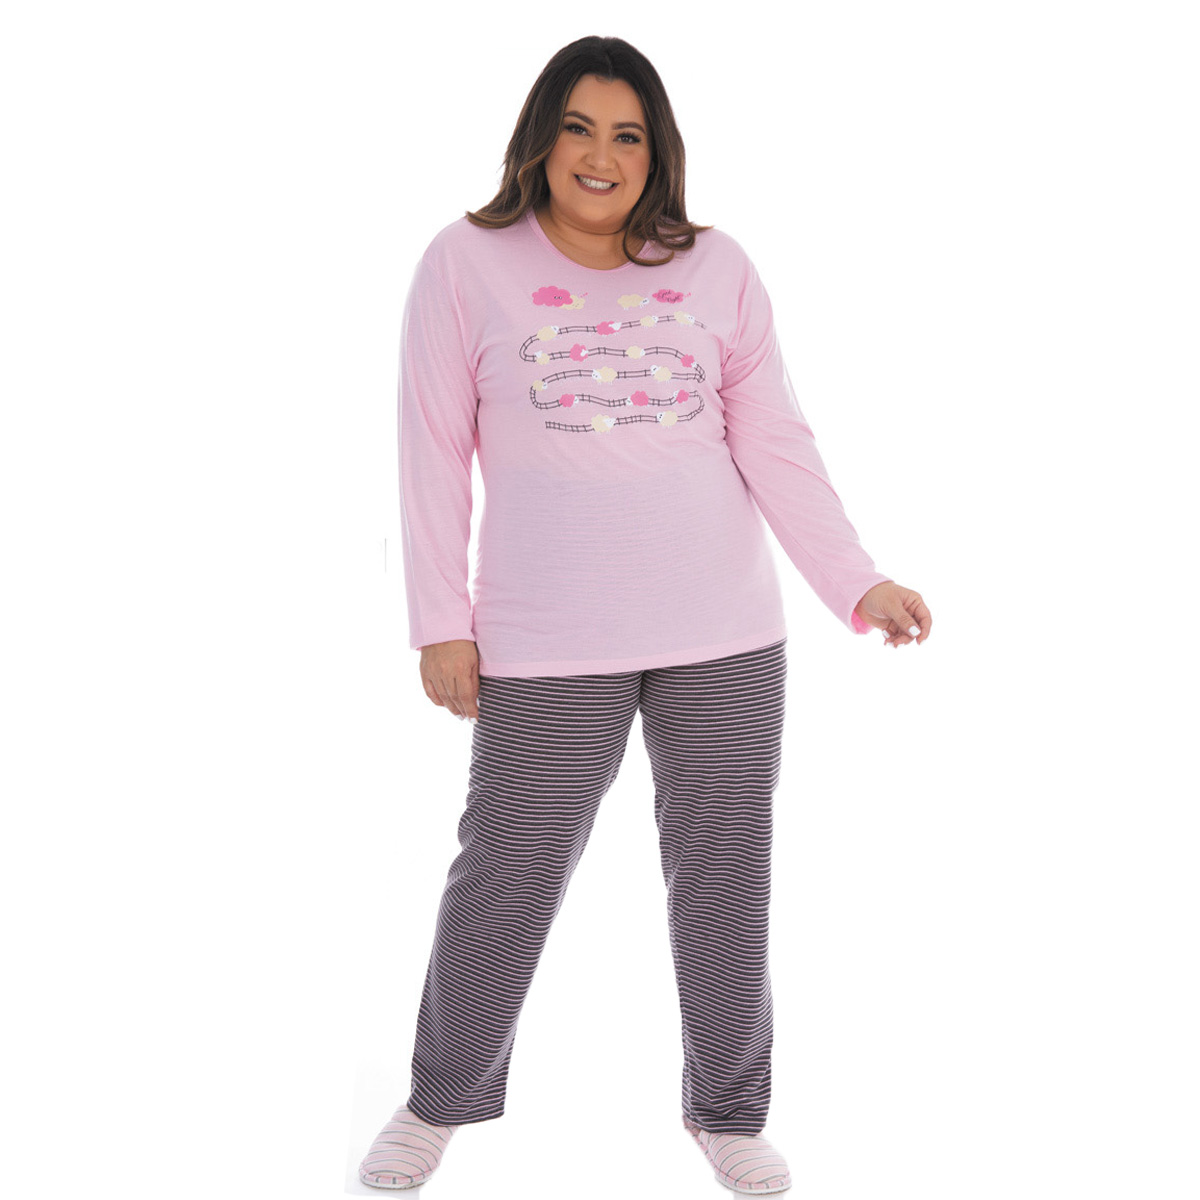 Pijama feminino plus size para o inverno CONFORT Victory